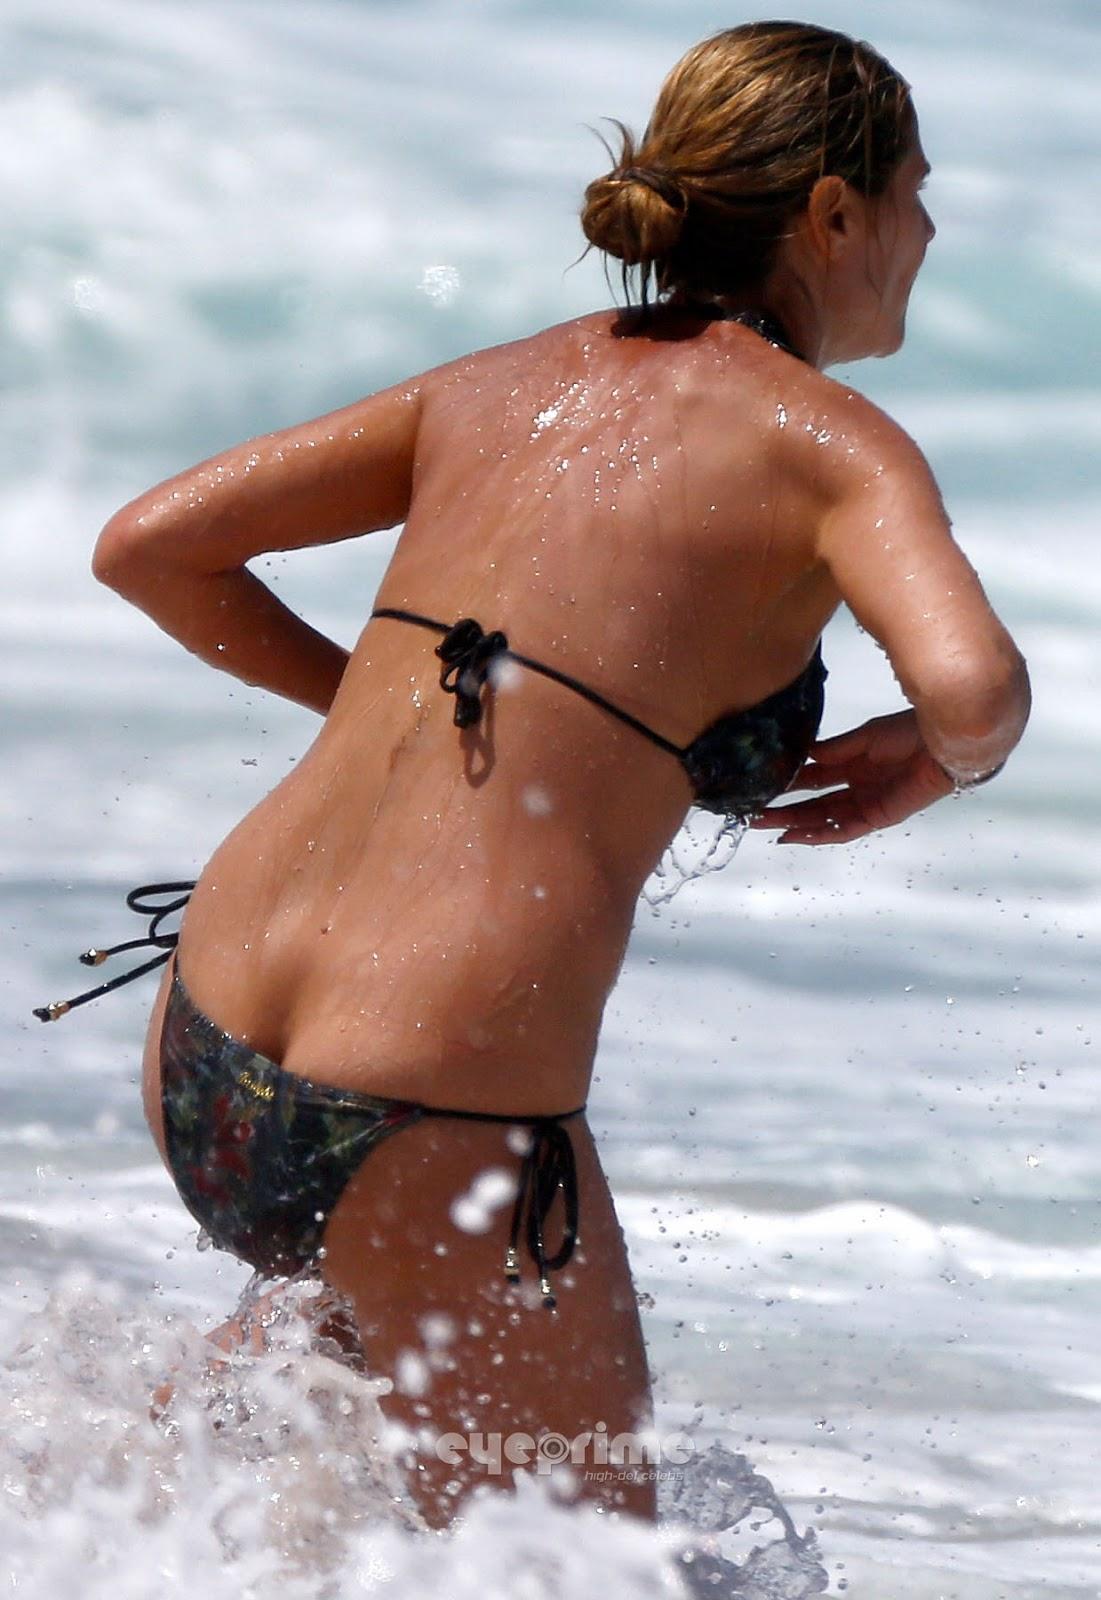 Heidi Klum Heidi Klum - Nipple Slip On The Beach In -3659